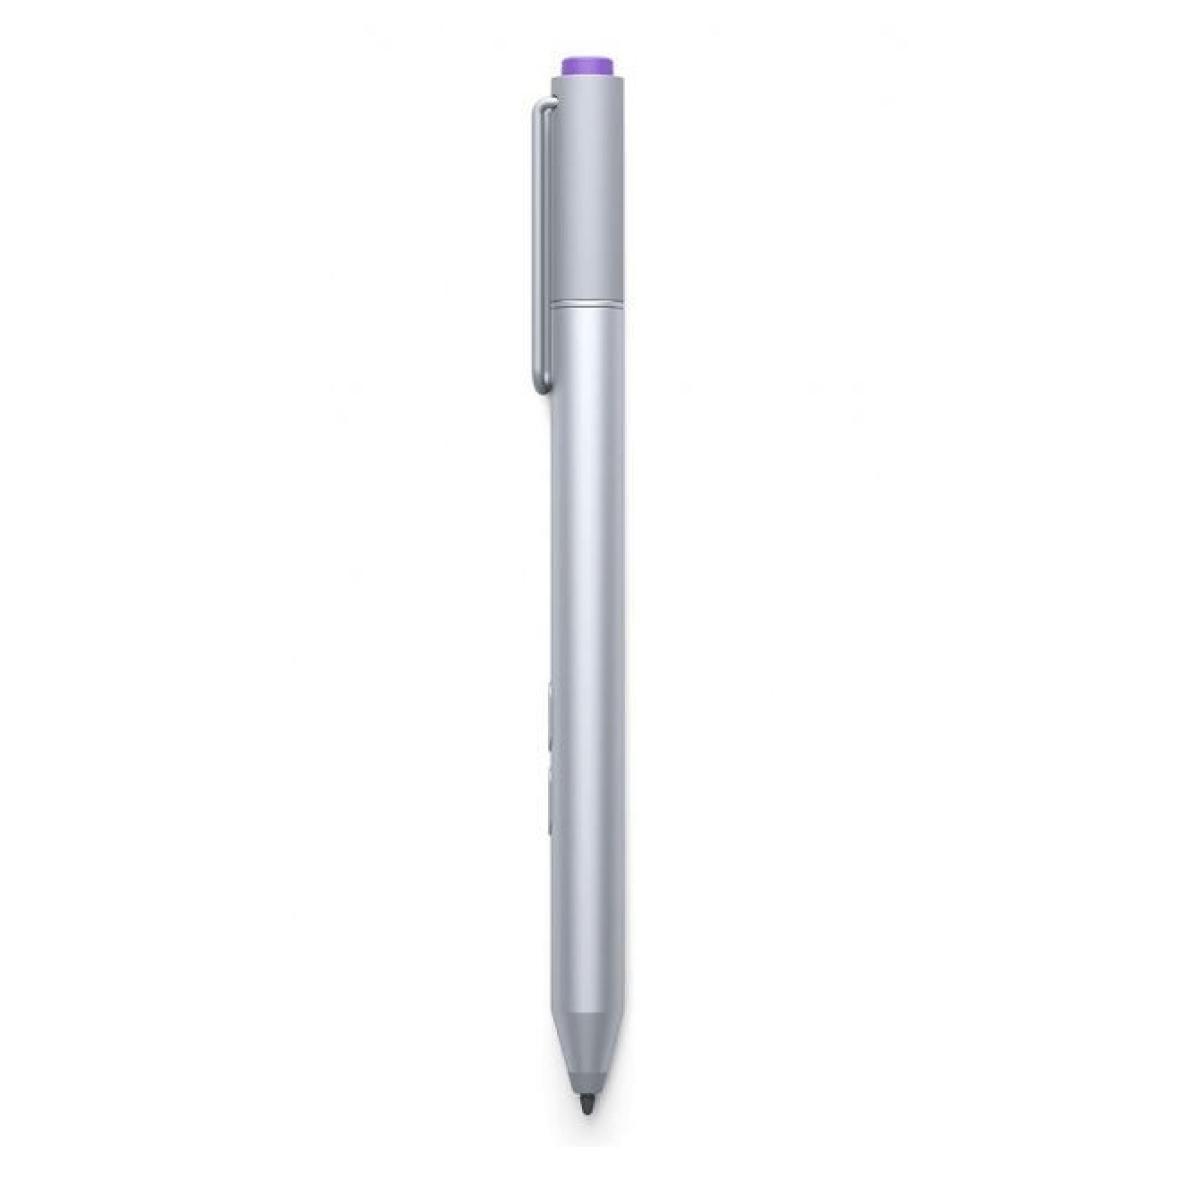 Microsoft® Surface Pen - Silver (Surface Pro 3)